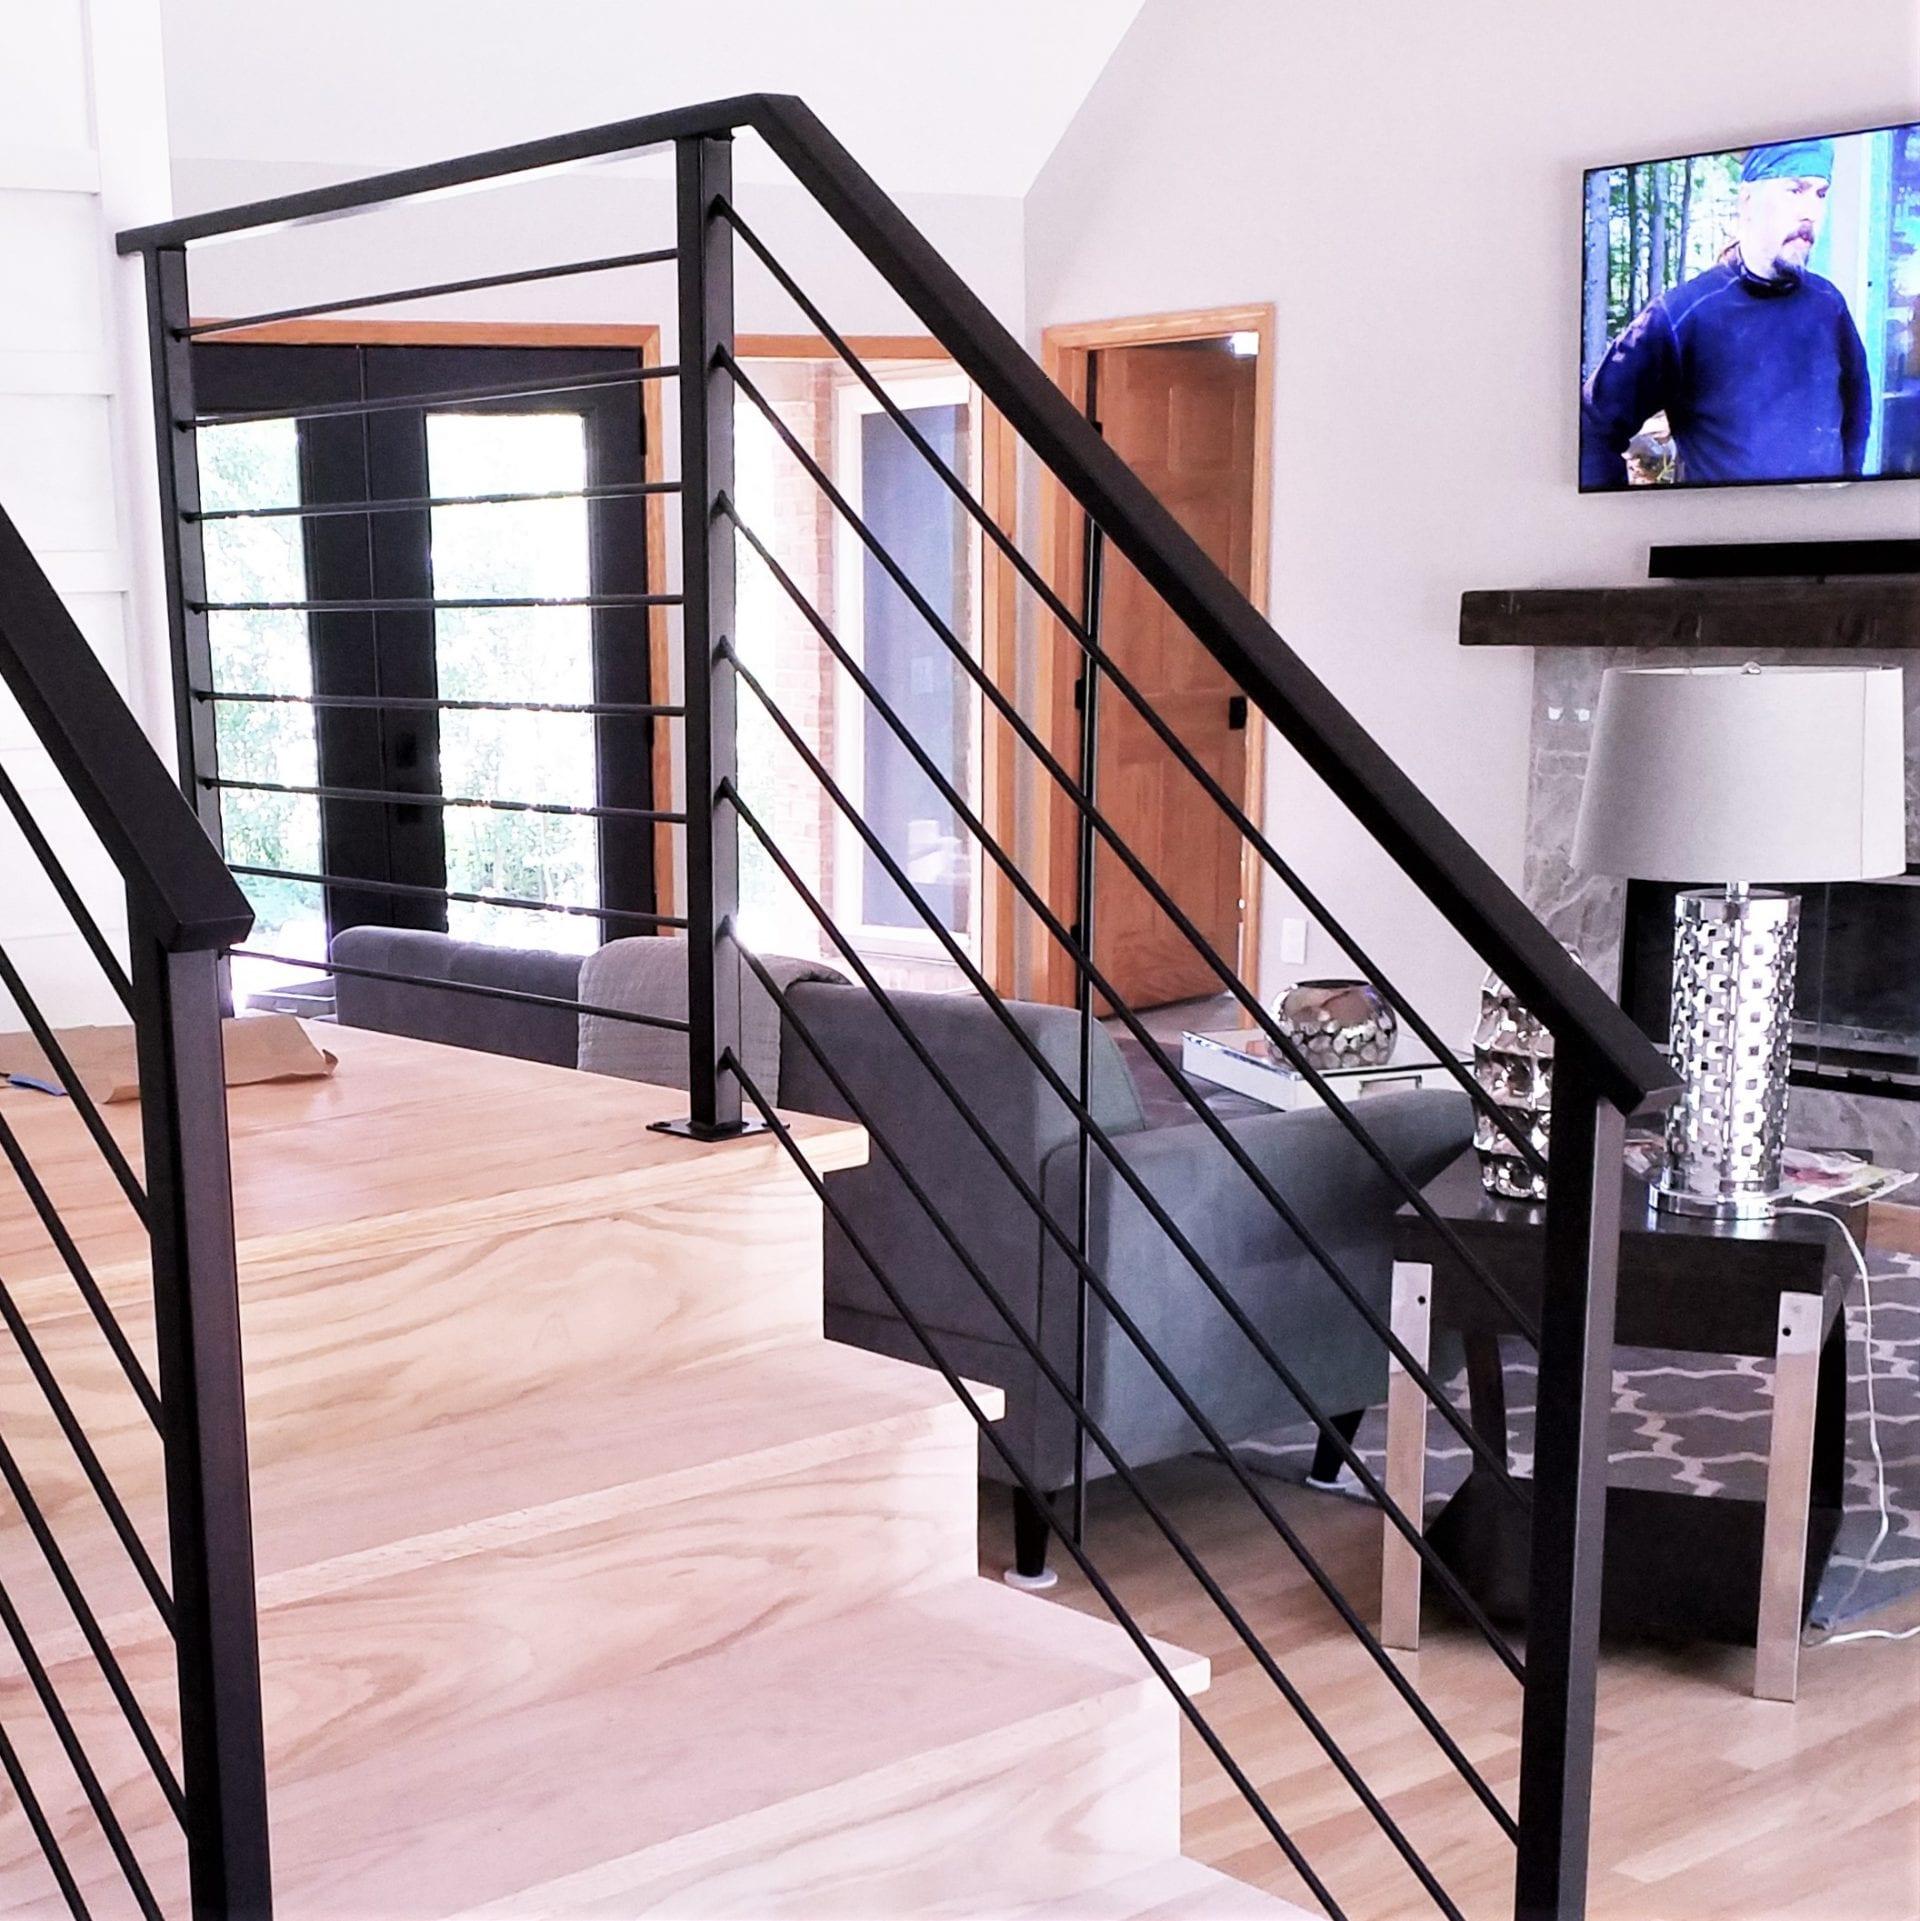 Matte Black Horizontal Rail for Interior Stairs - Great ...